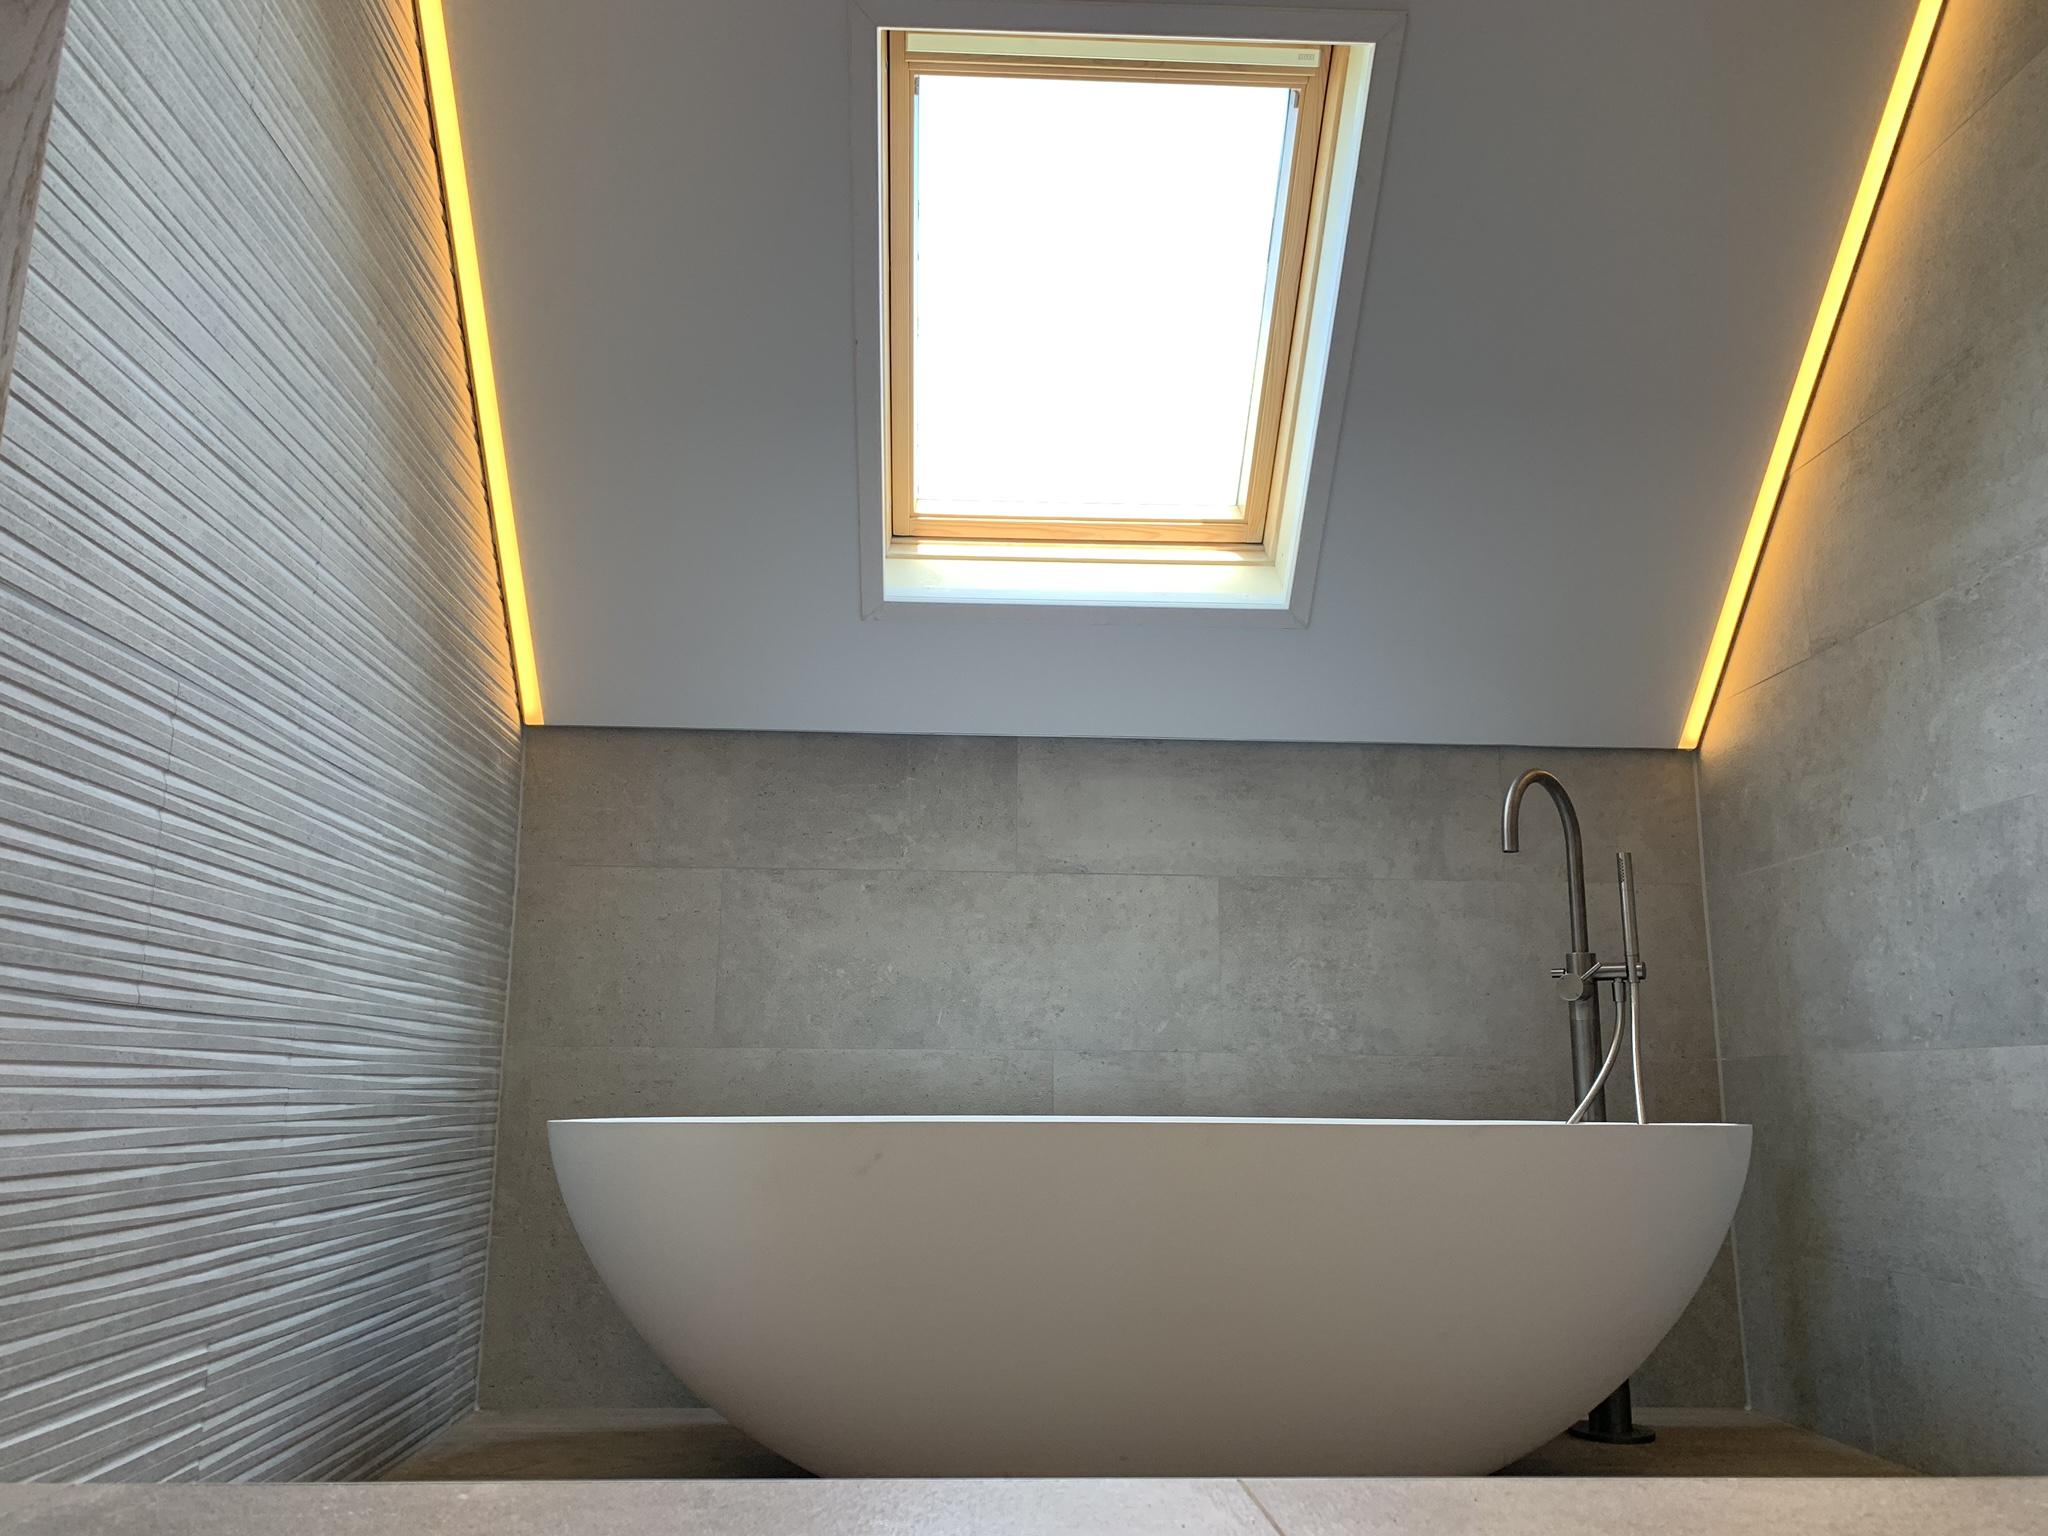 warme sfeerverlichting in badkamers